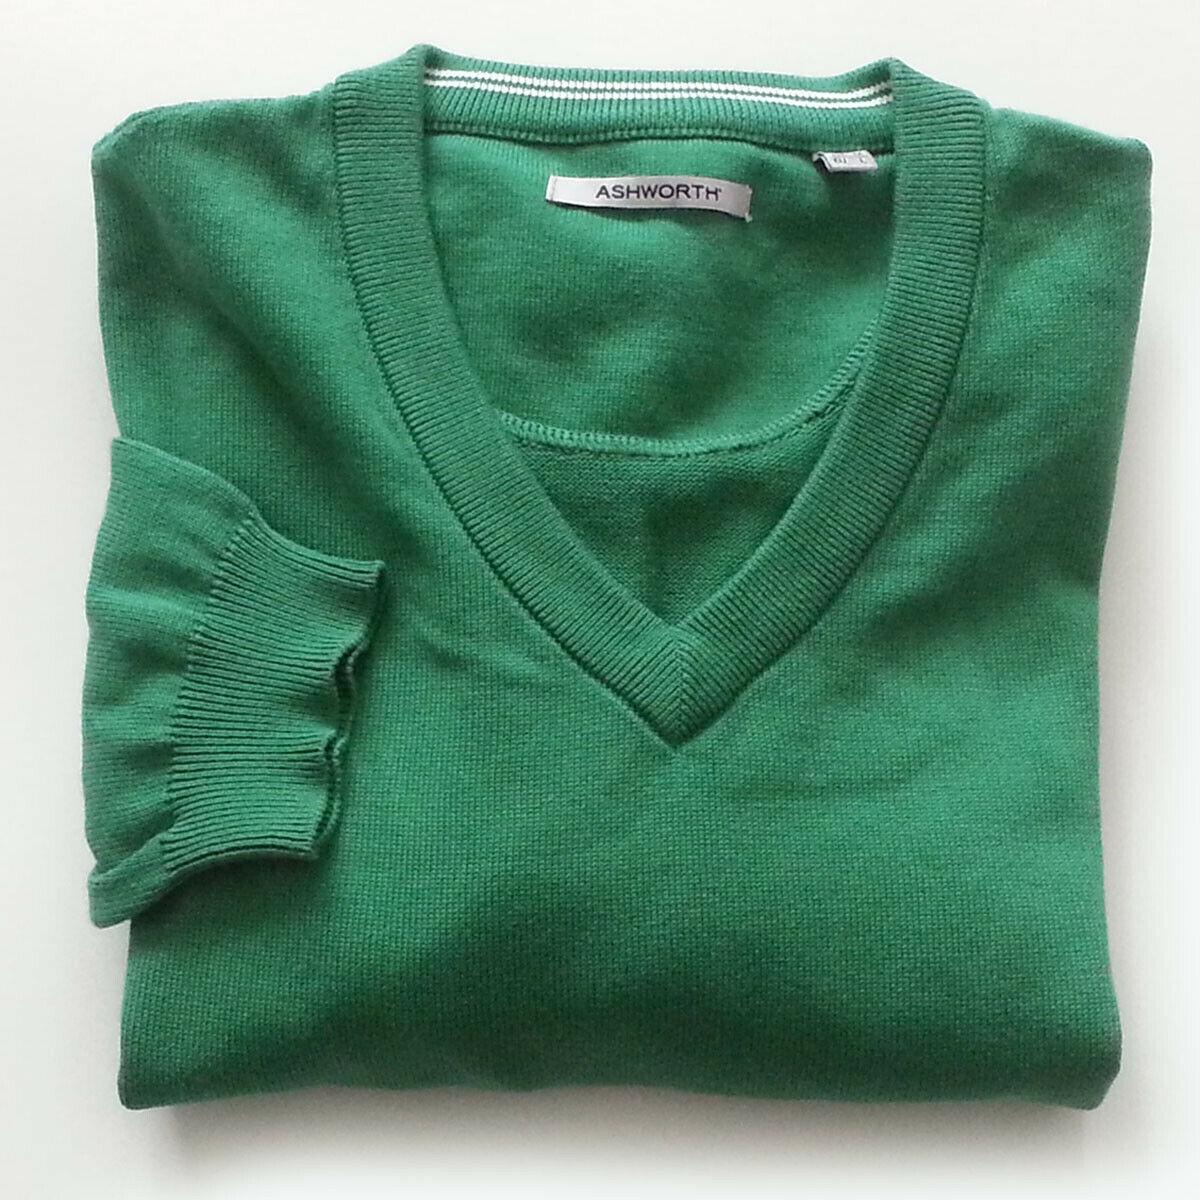 Sale $27.97 ebay.to/2KLhQYq Ashworth #sweater Men Size M Green #cotton V-Neck